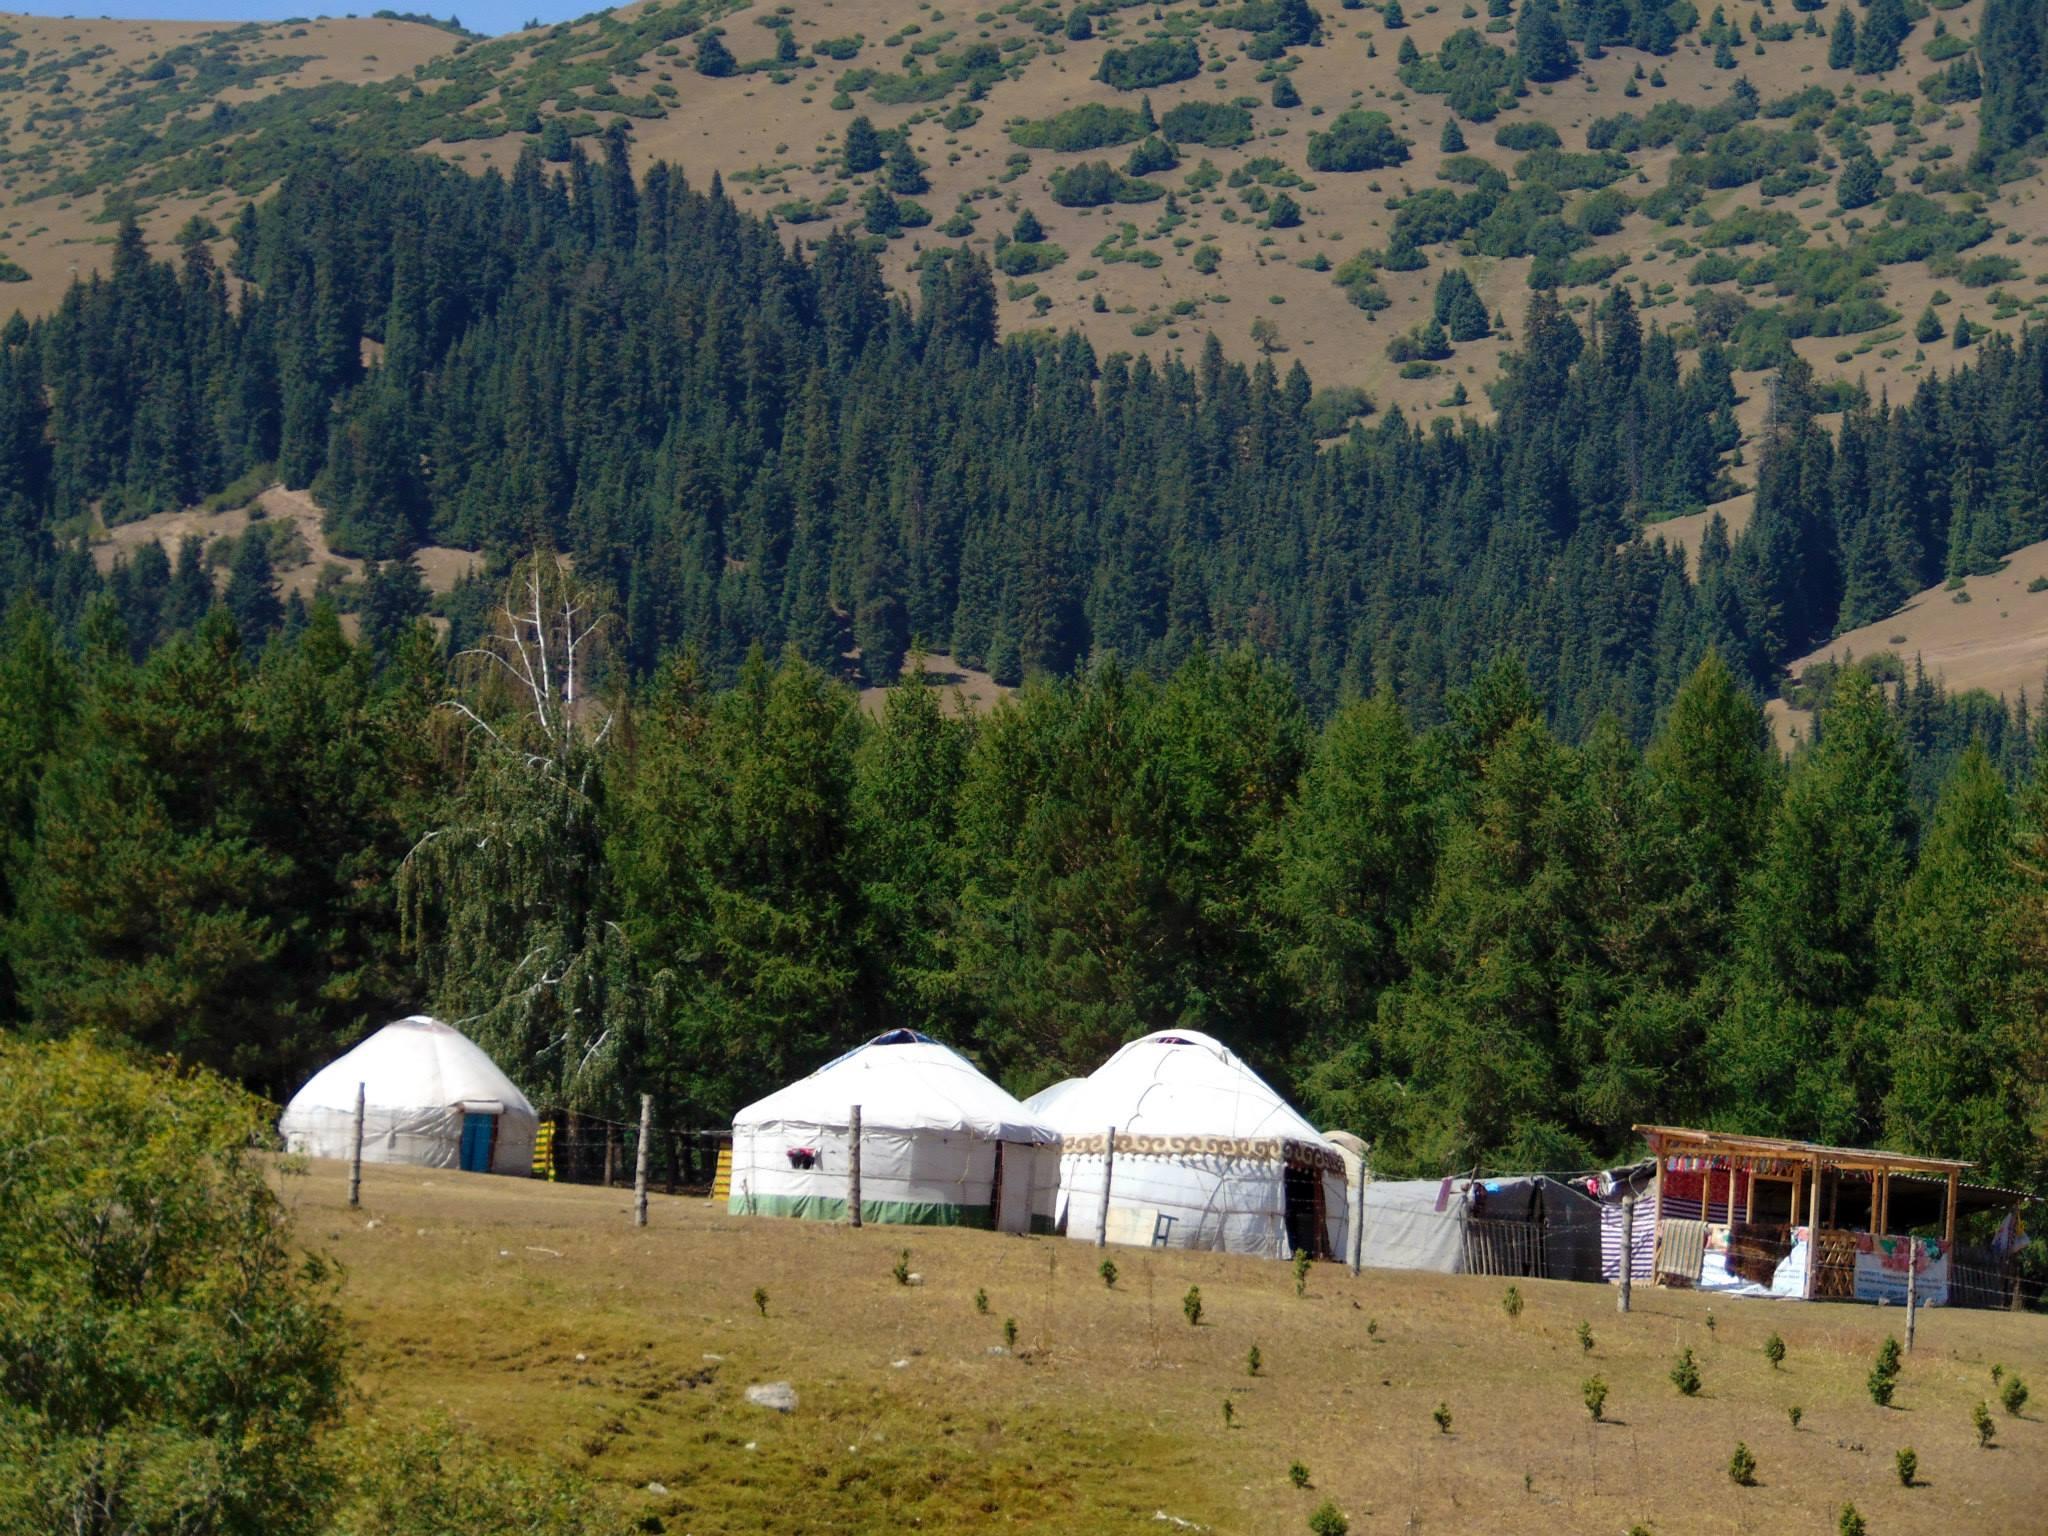 юрты. джалал-абад. ферганская долина. предгорье тянь-шаня. путешествия кати. киргизия